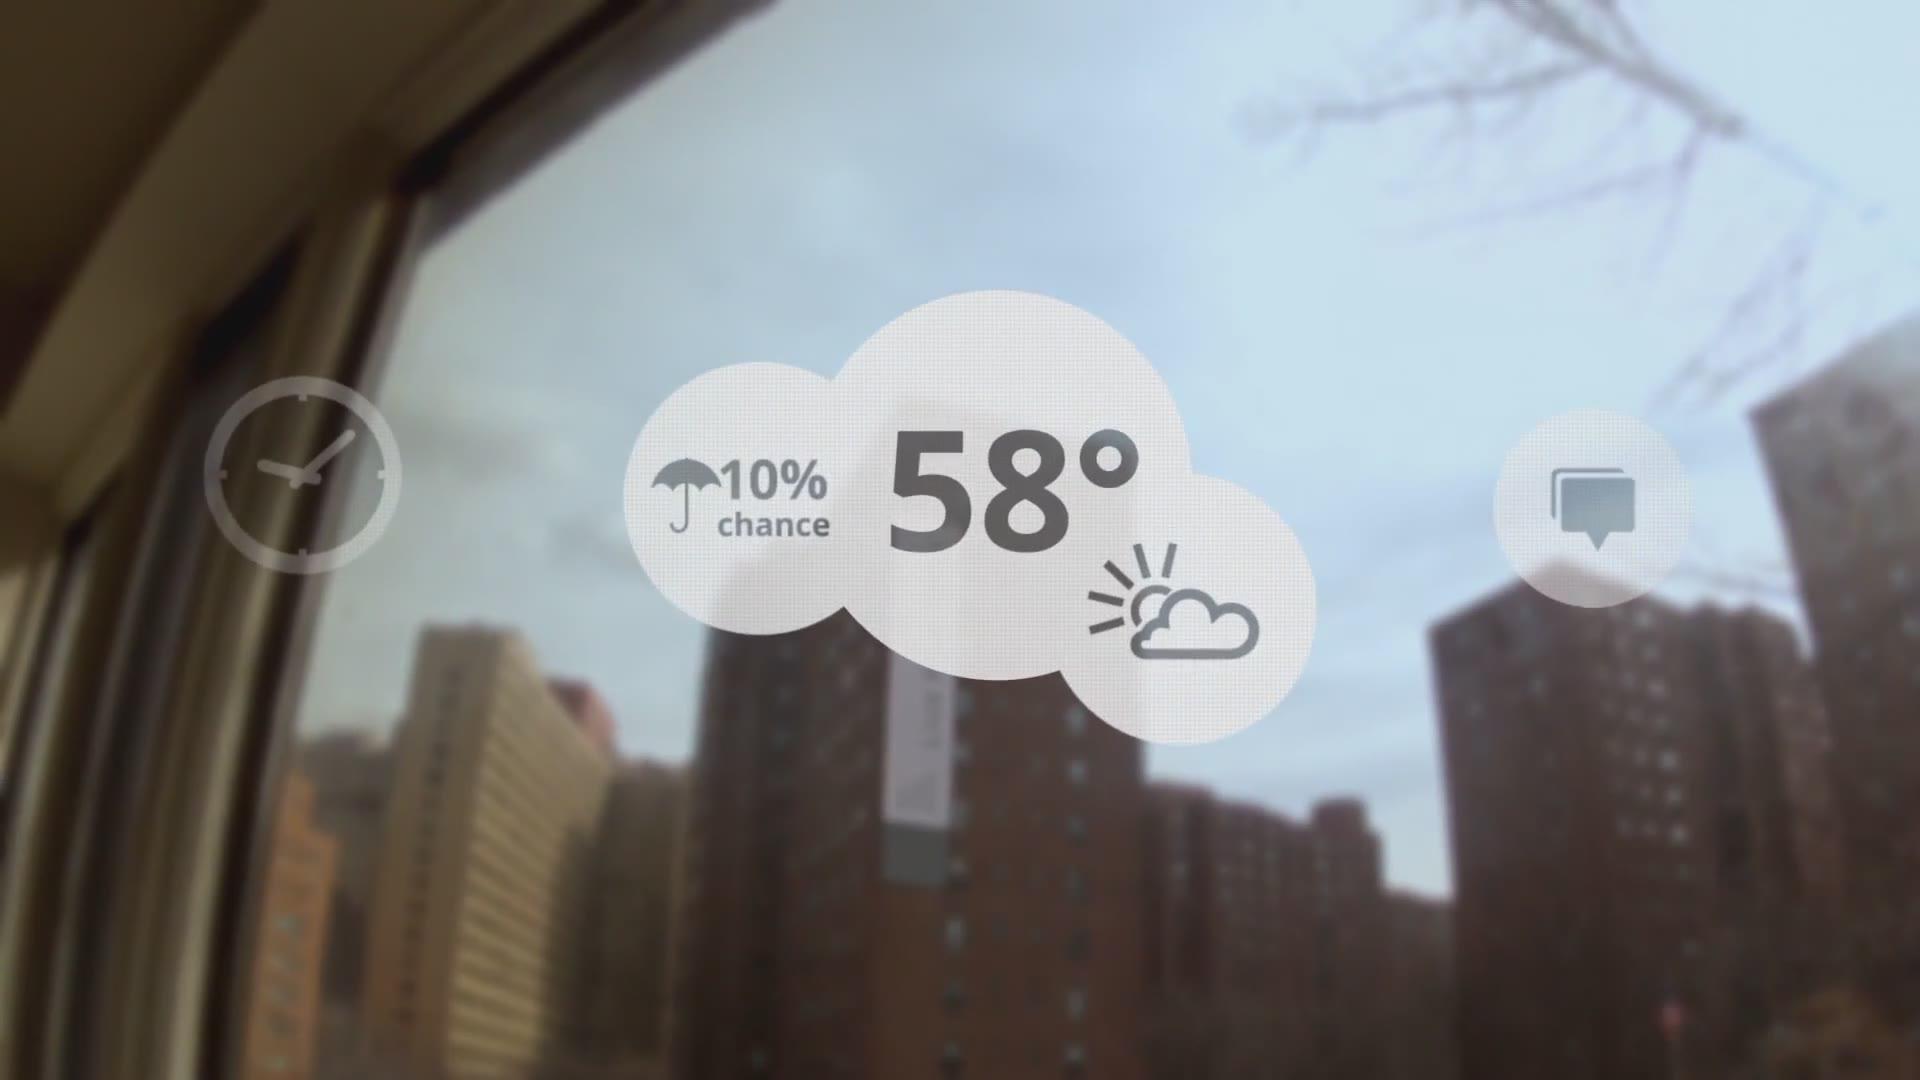 Google desvela en un espectacular vídeo su proyecto de gafas conectadas a Internet